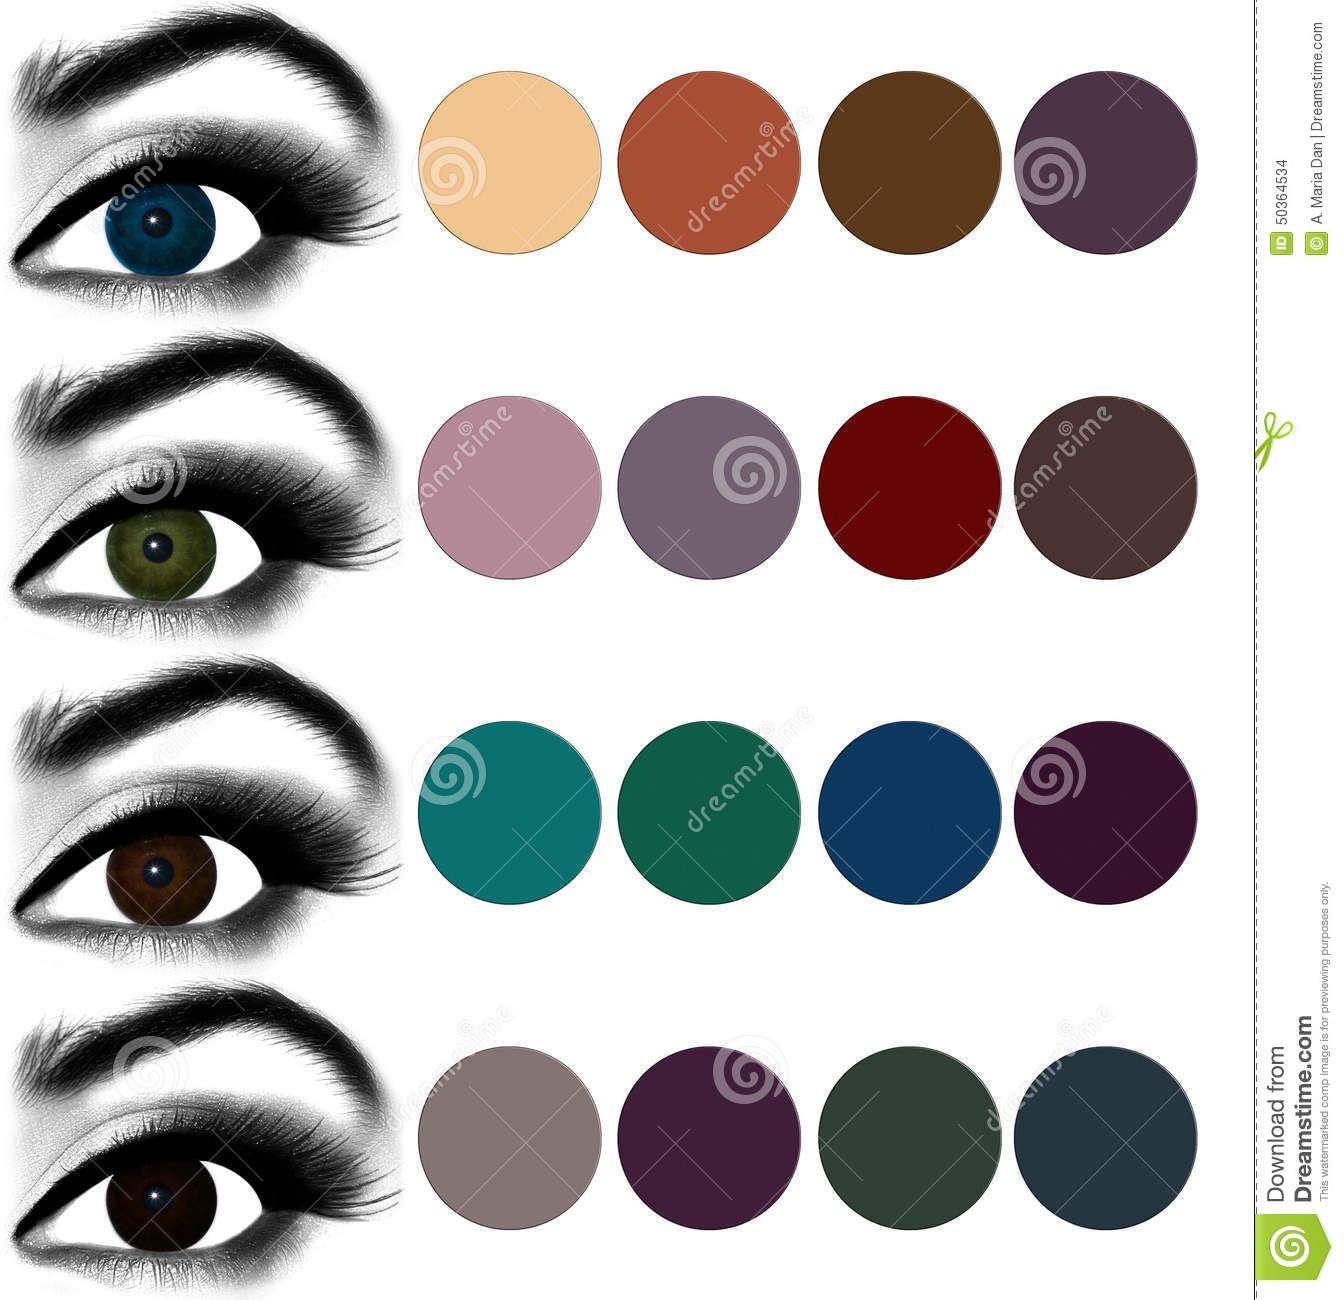 eye makeup for green eyes - google search   make up   makeup